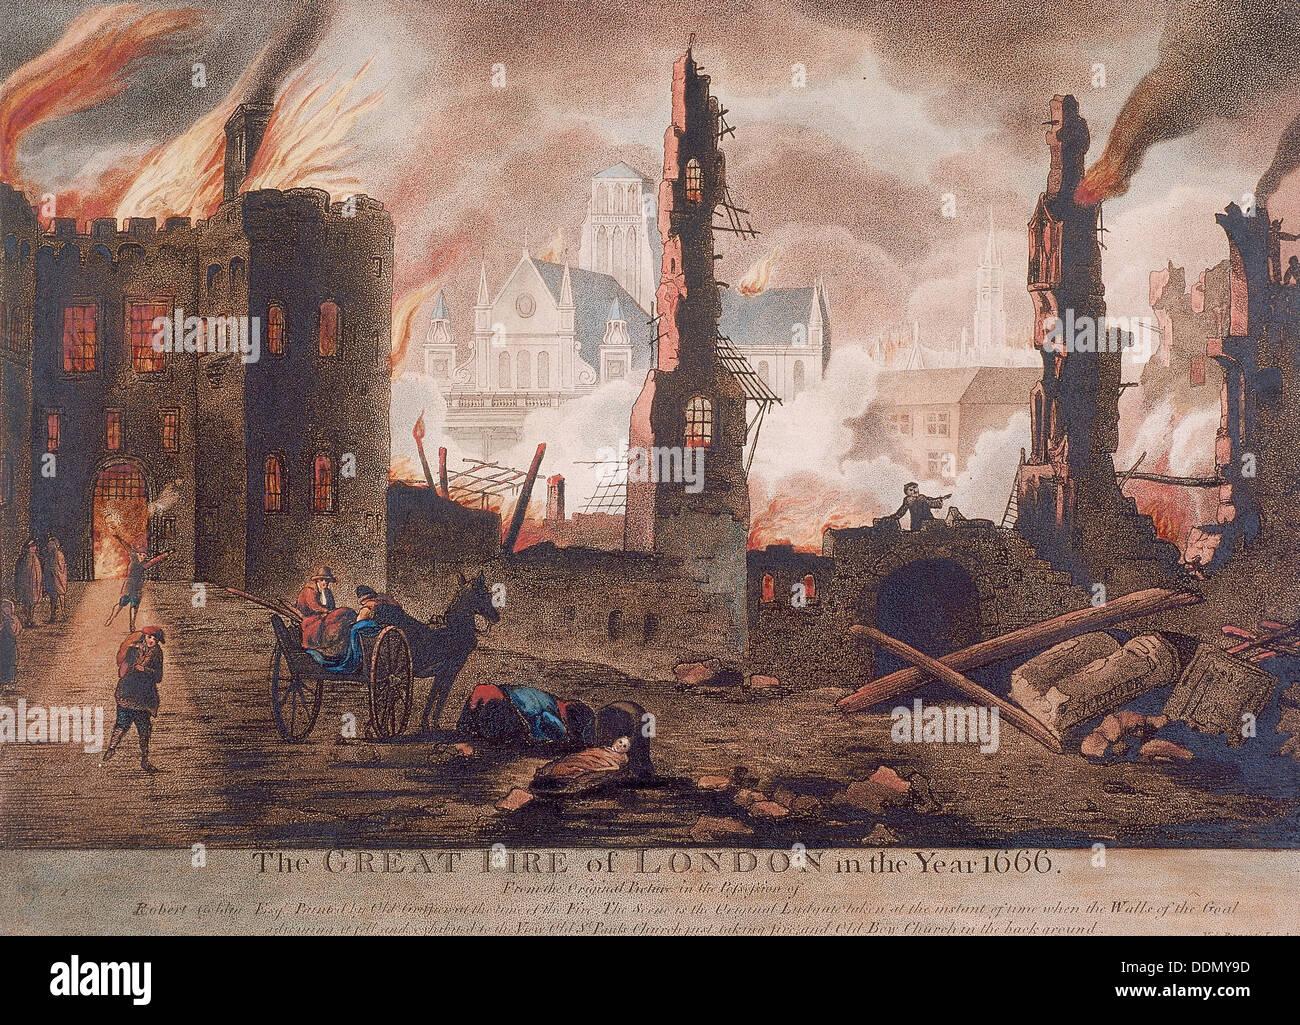 Ludgate great fire of london london 1792 artist william birch